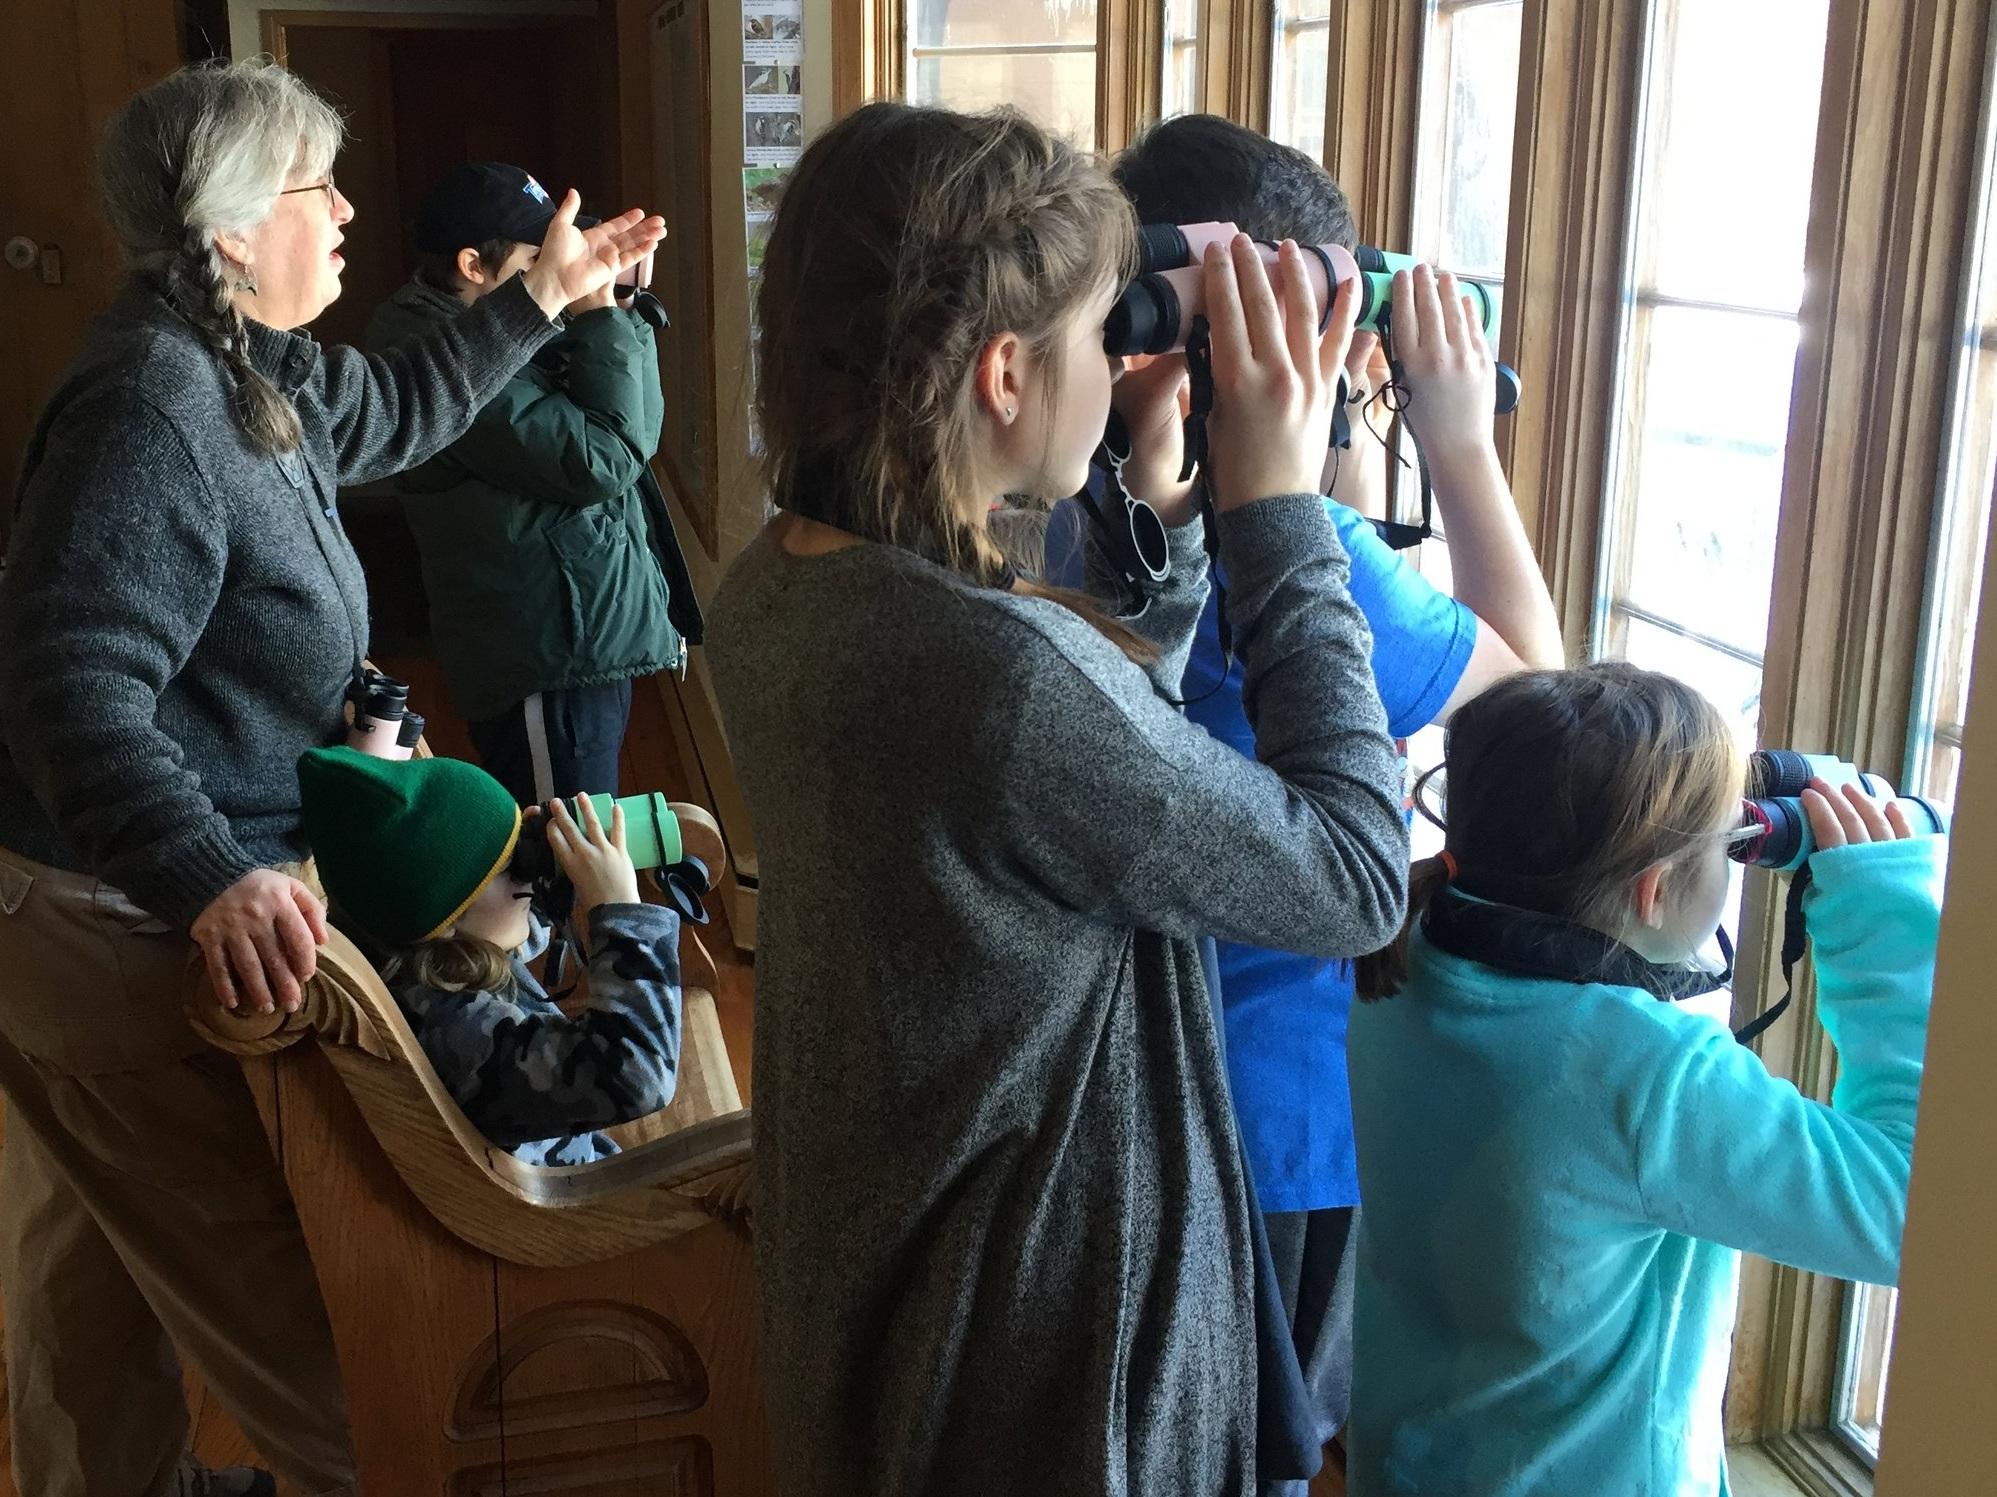 Ellen Rathbone educates visitors about the birds at Severson Dells.